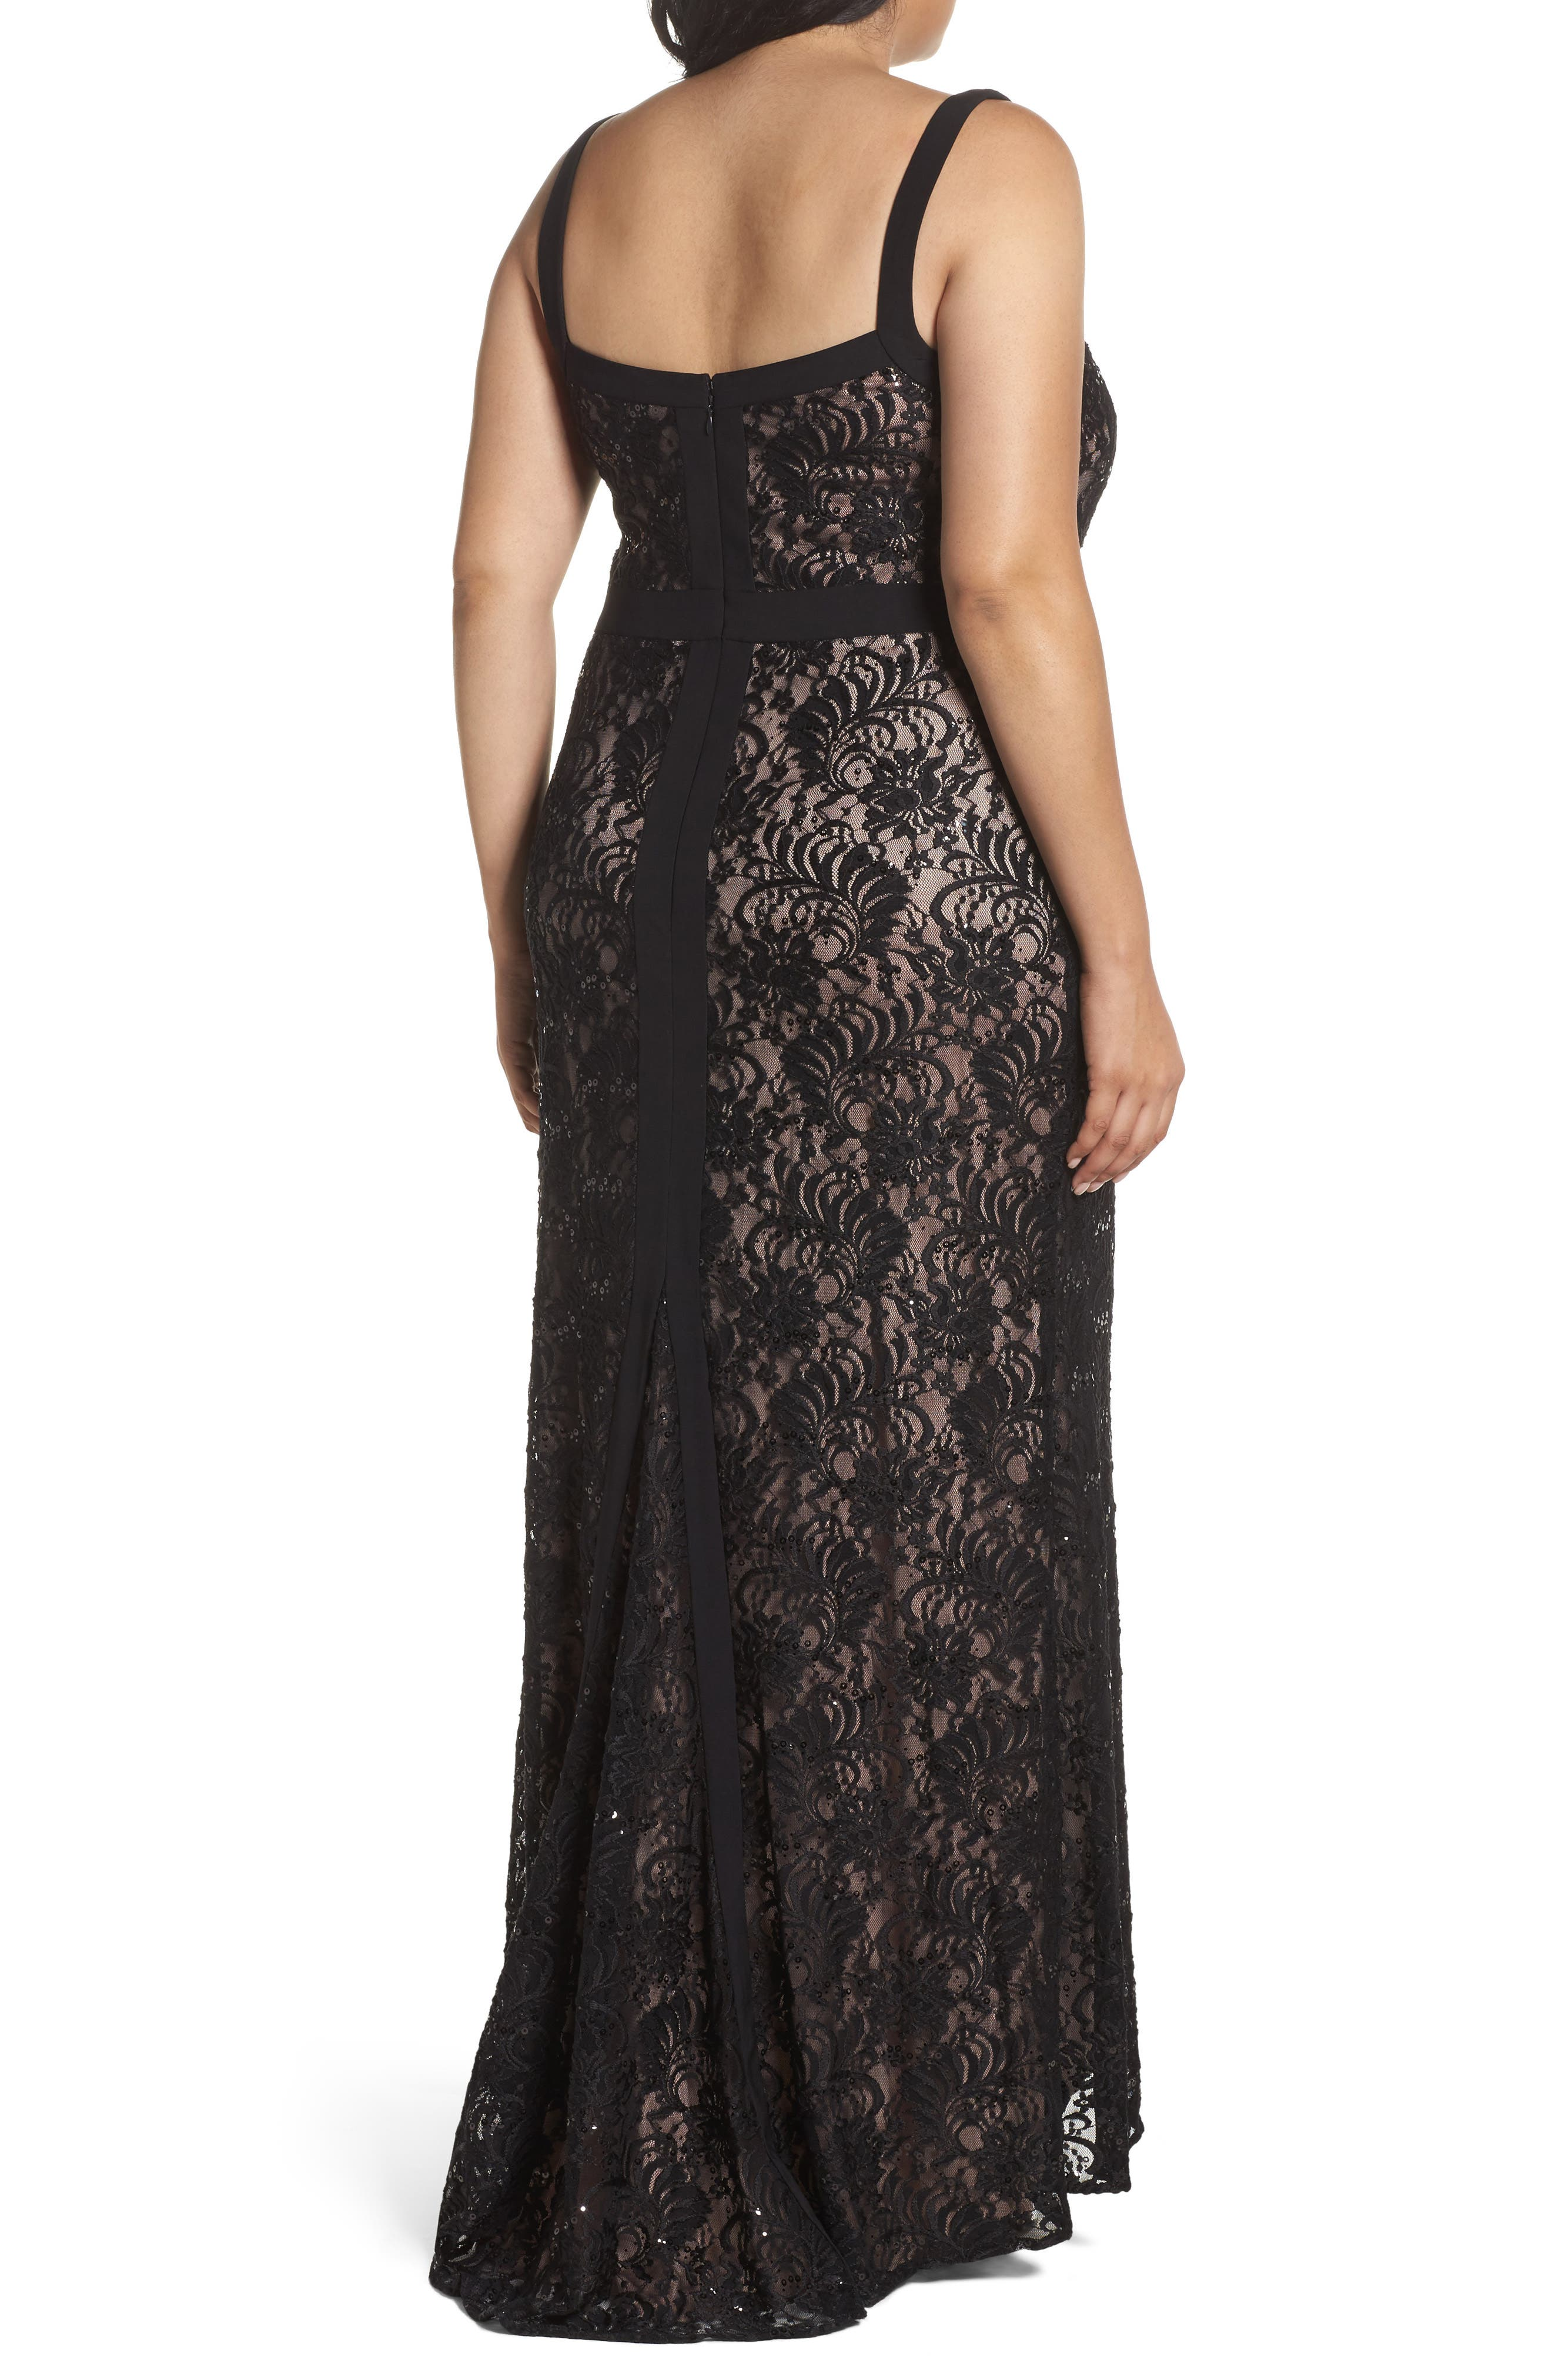 Lace Square Neck Gown,                             Alternate thumbnail 2, color,                             Black/ Nude